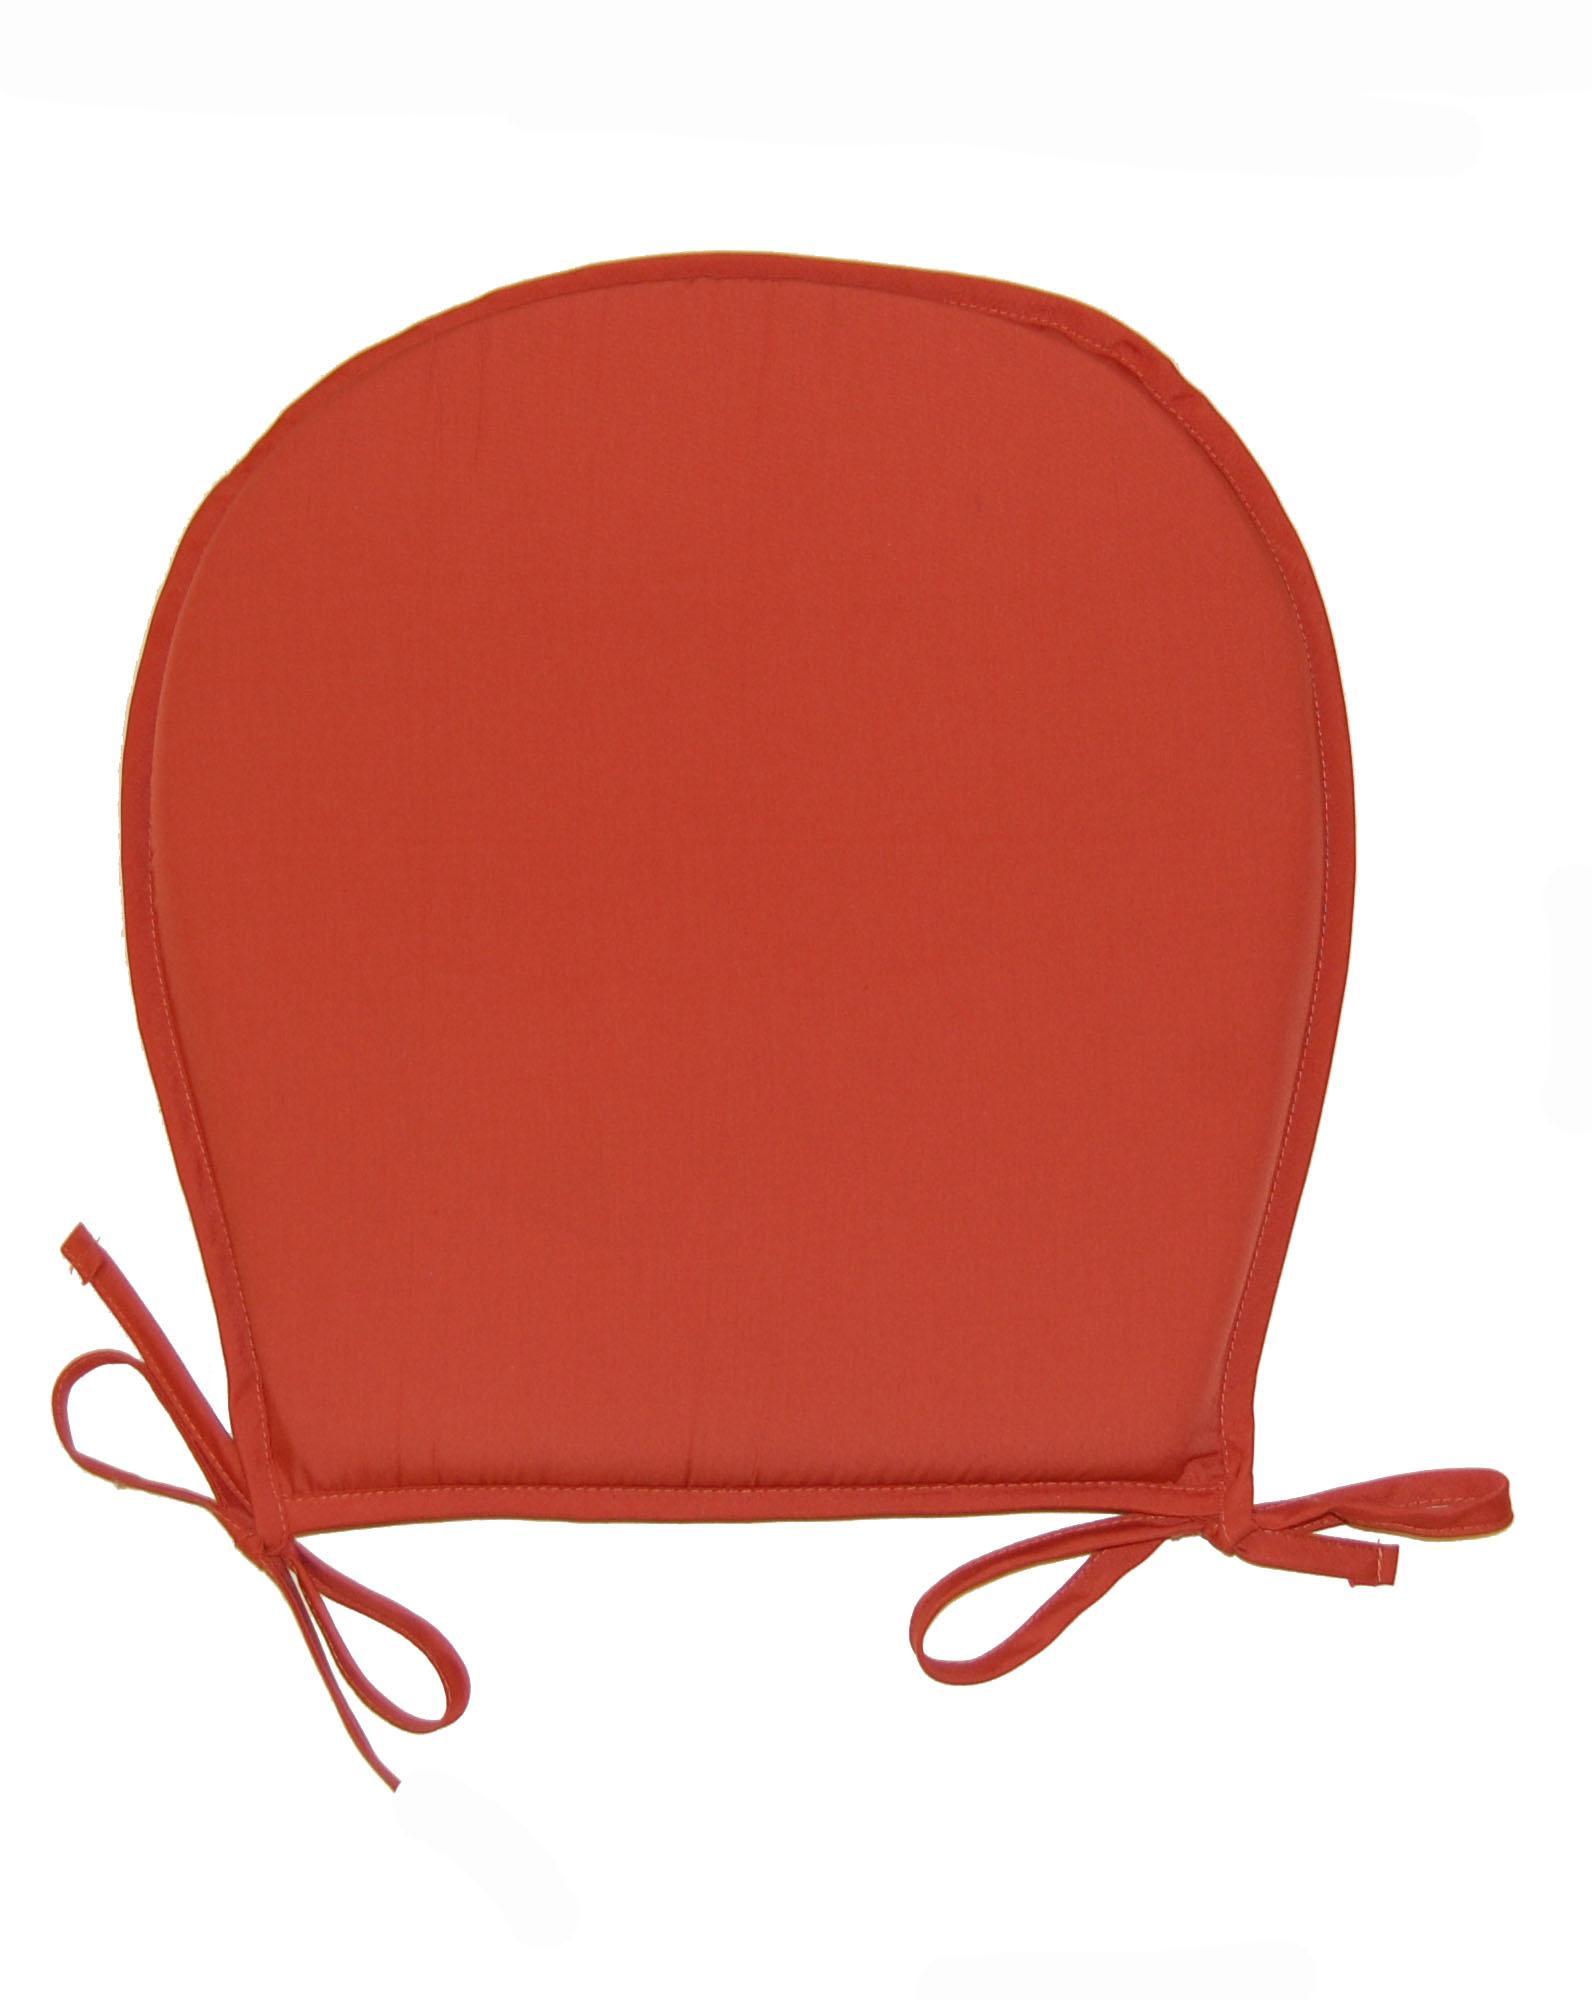 Kitchen chair cushion covers Photo - 11